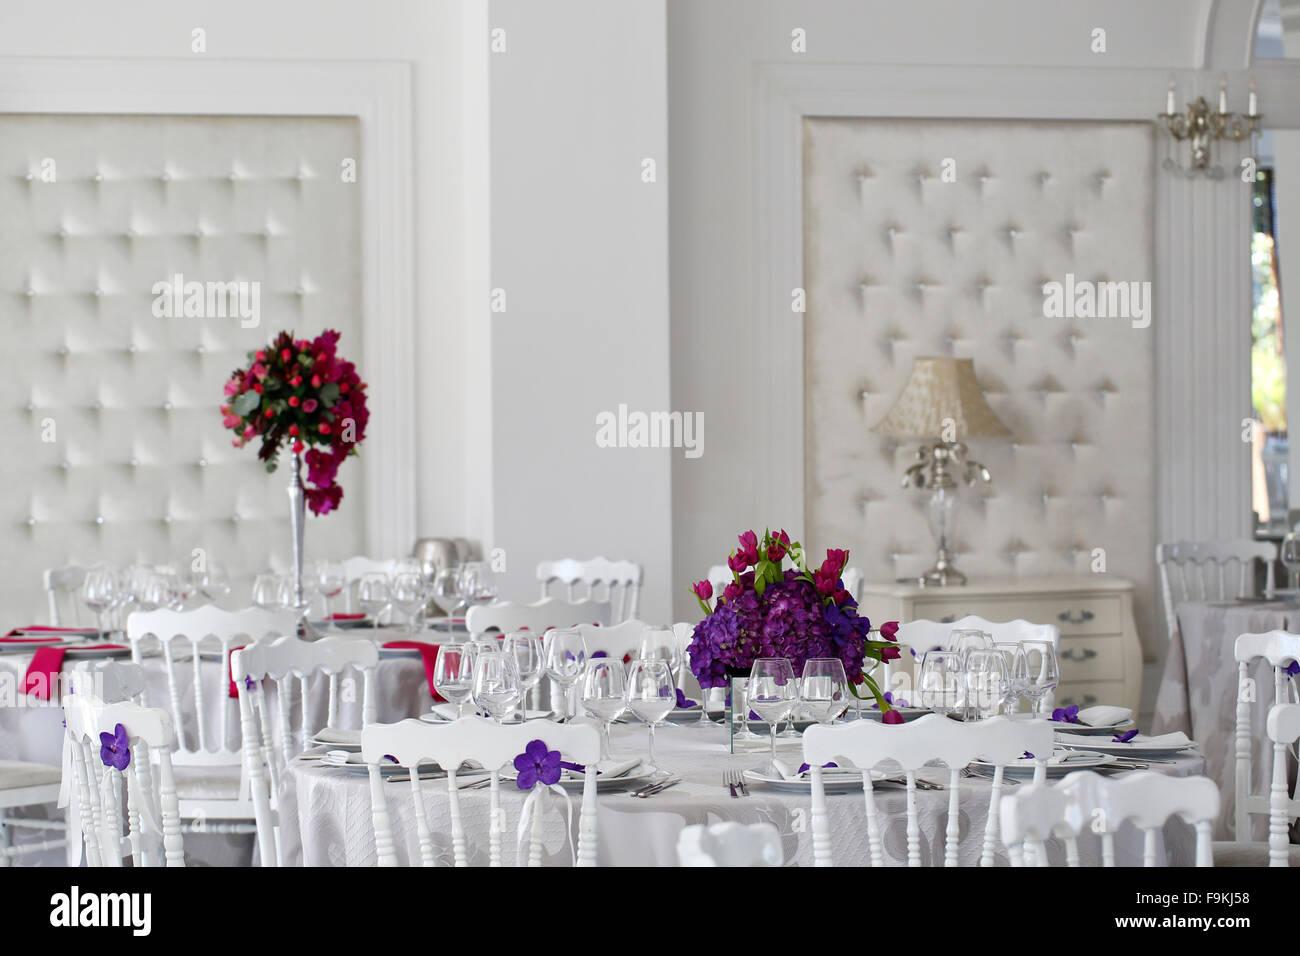 flowers wedding table arrangement stock photos flowers wedding